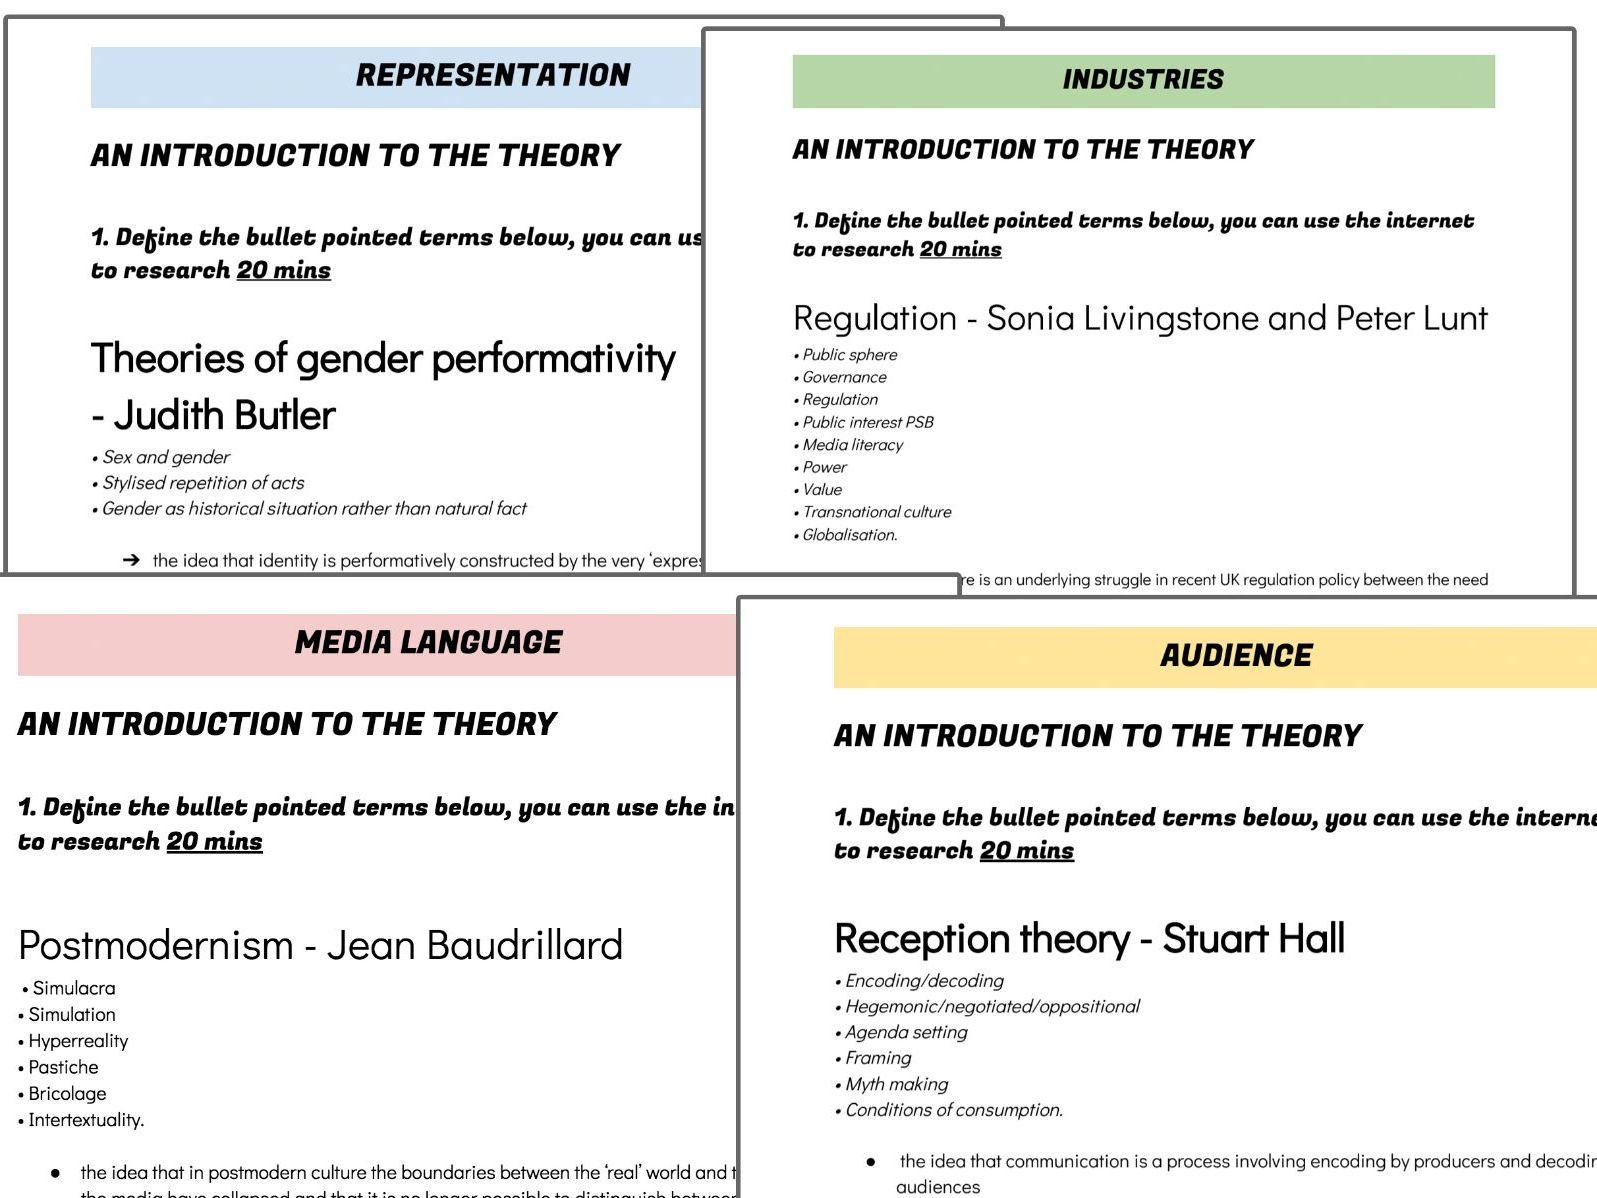 WJEC Media A Level Representation, industries, Audience & Media Language worksheets FULL BUNDLE